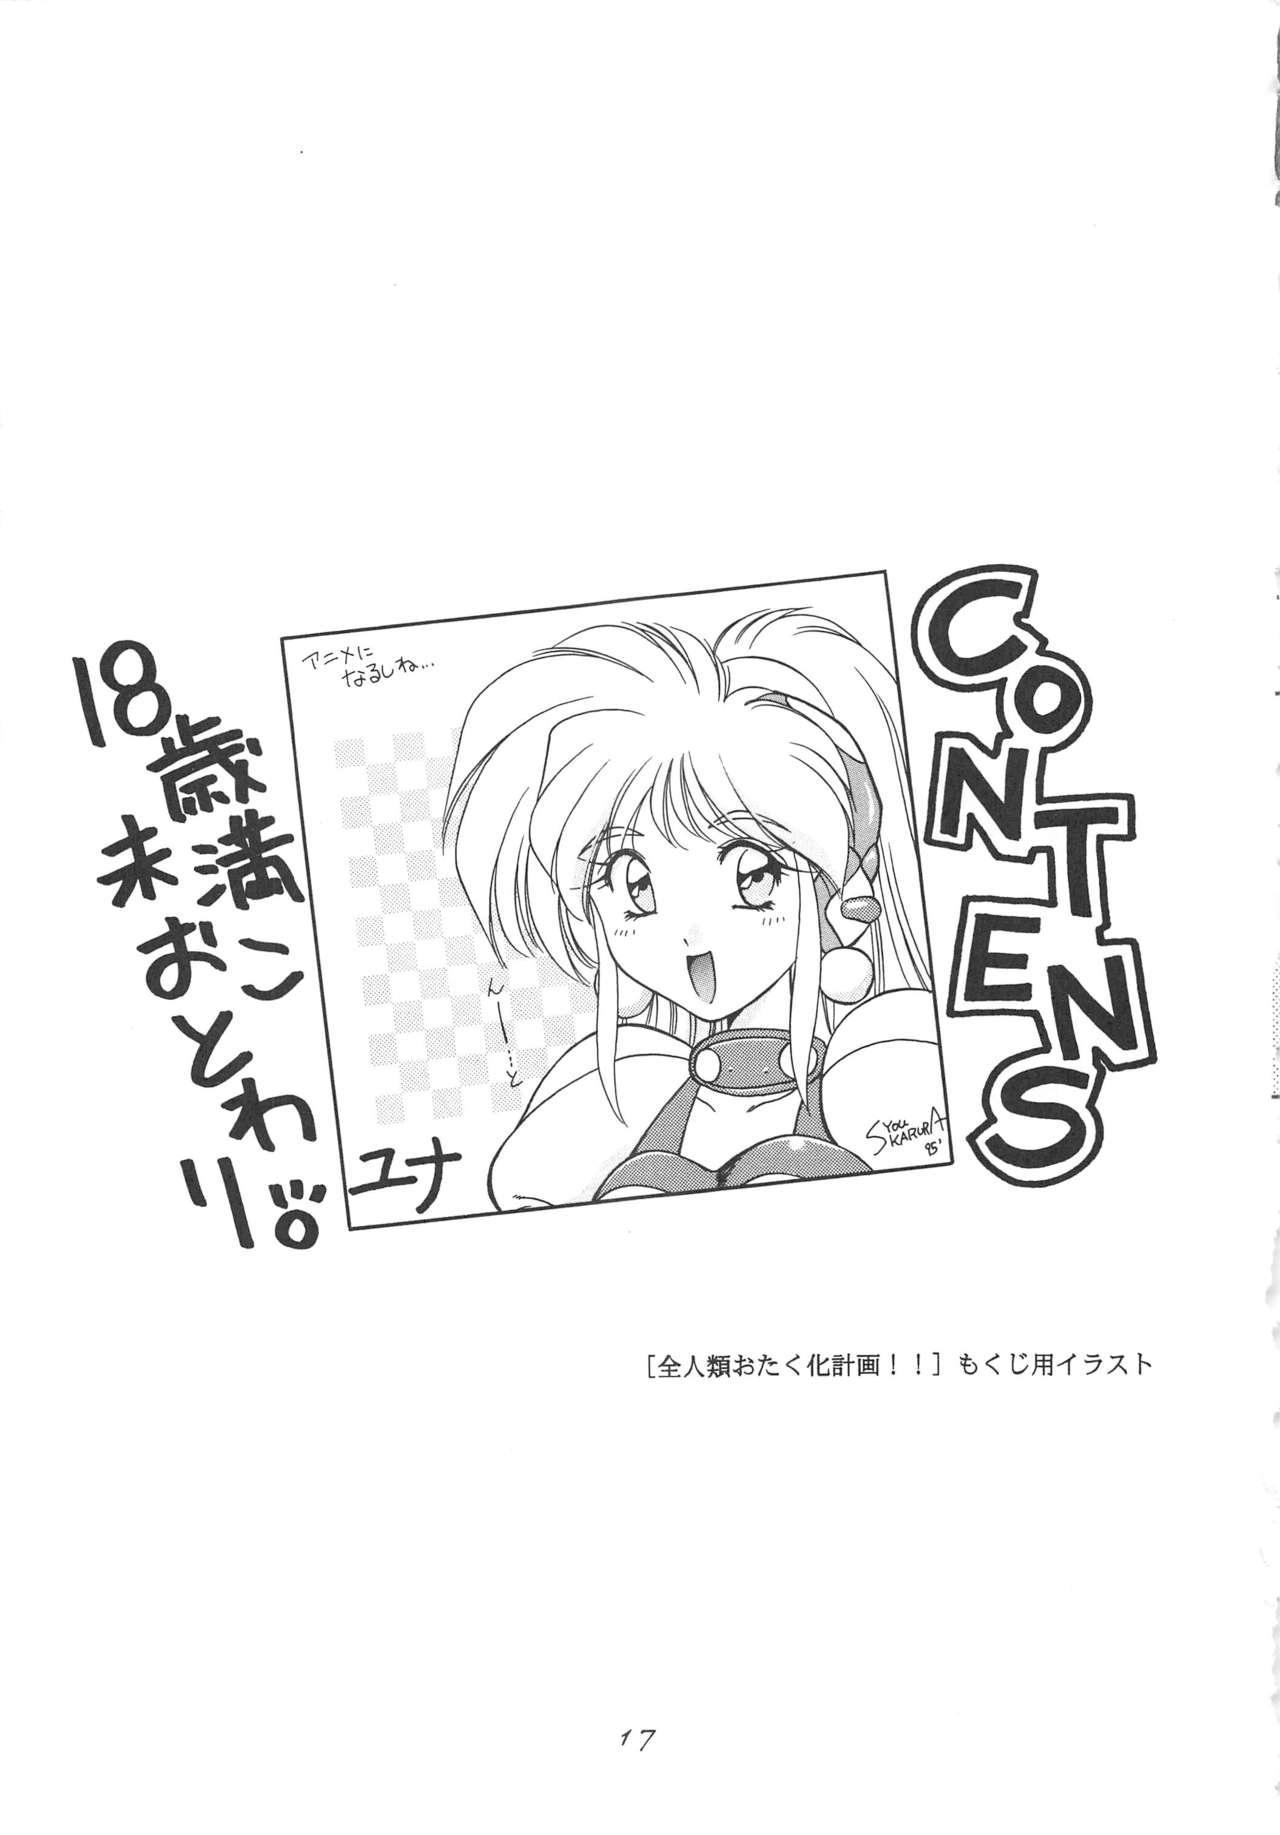 INDIVIDUAL 3 - 19930816 → 16